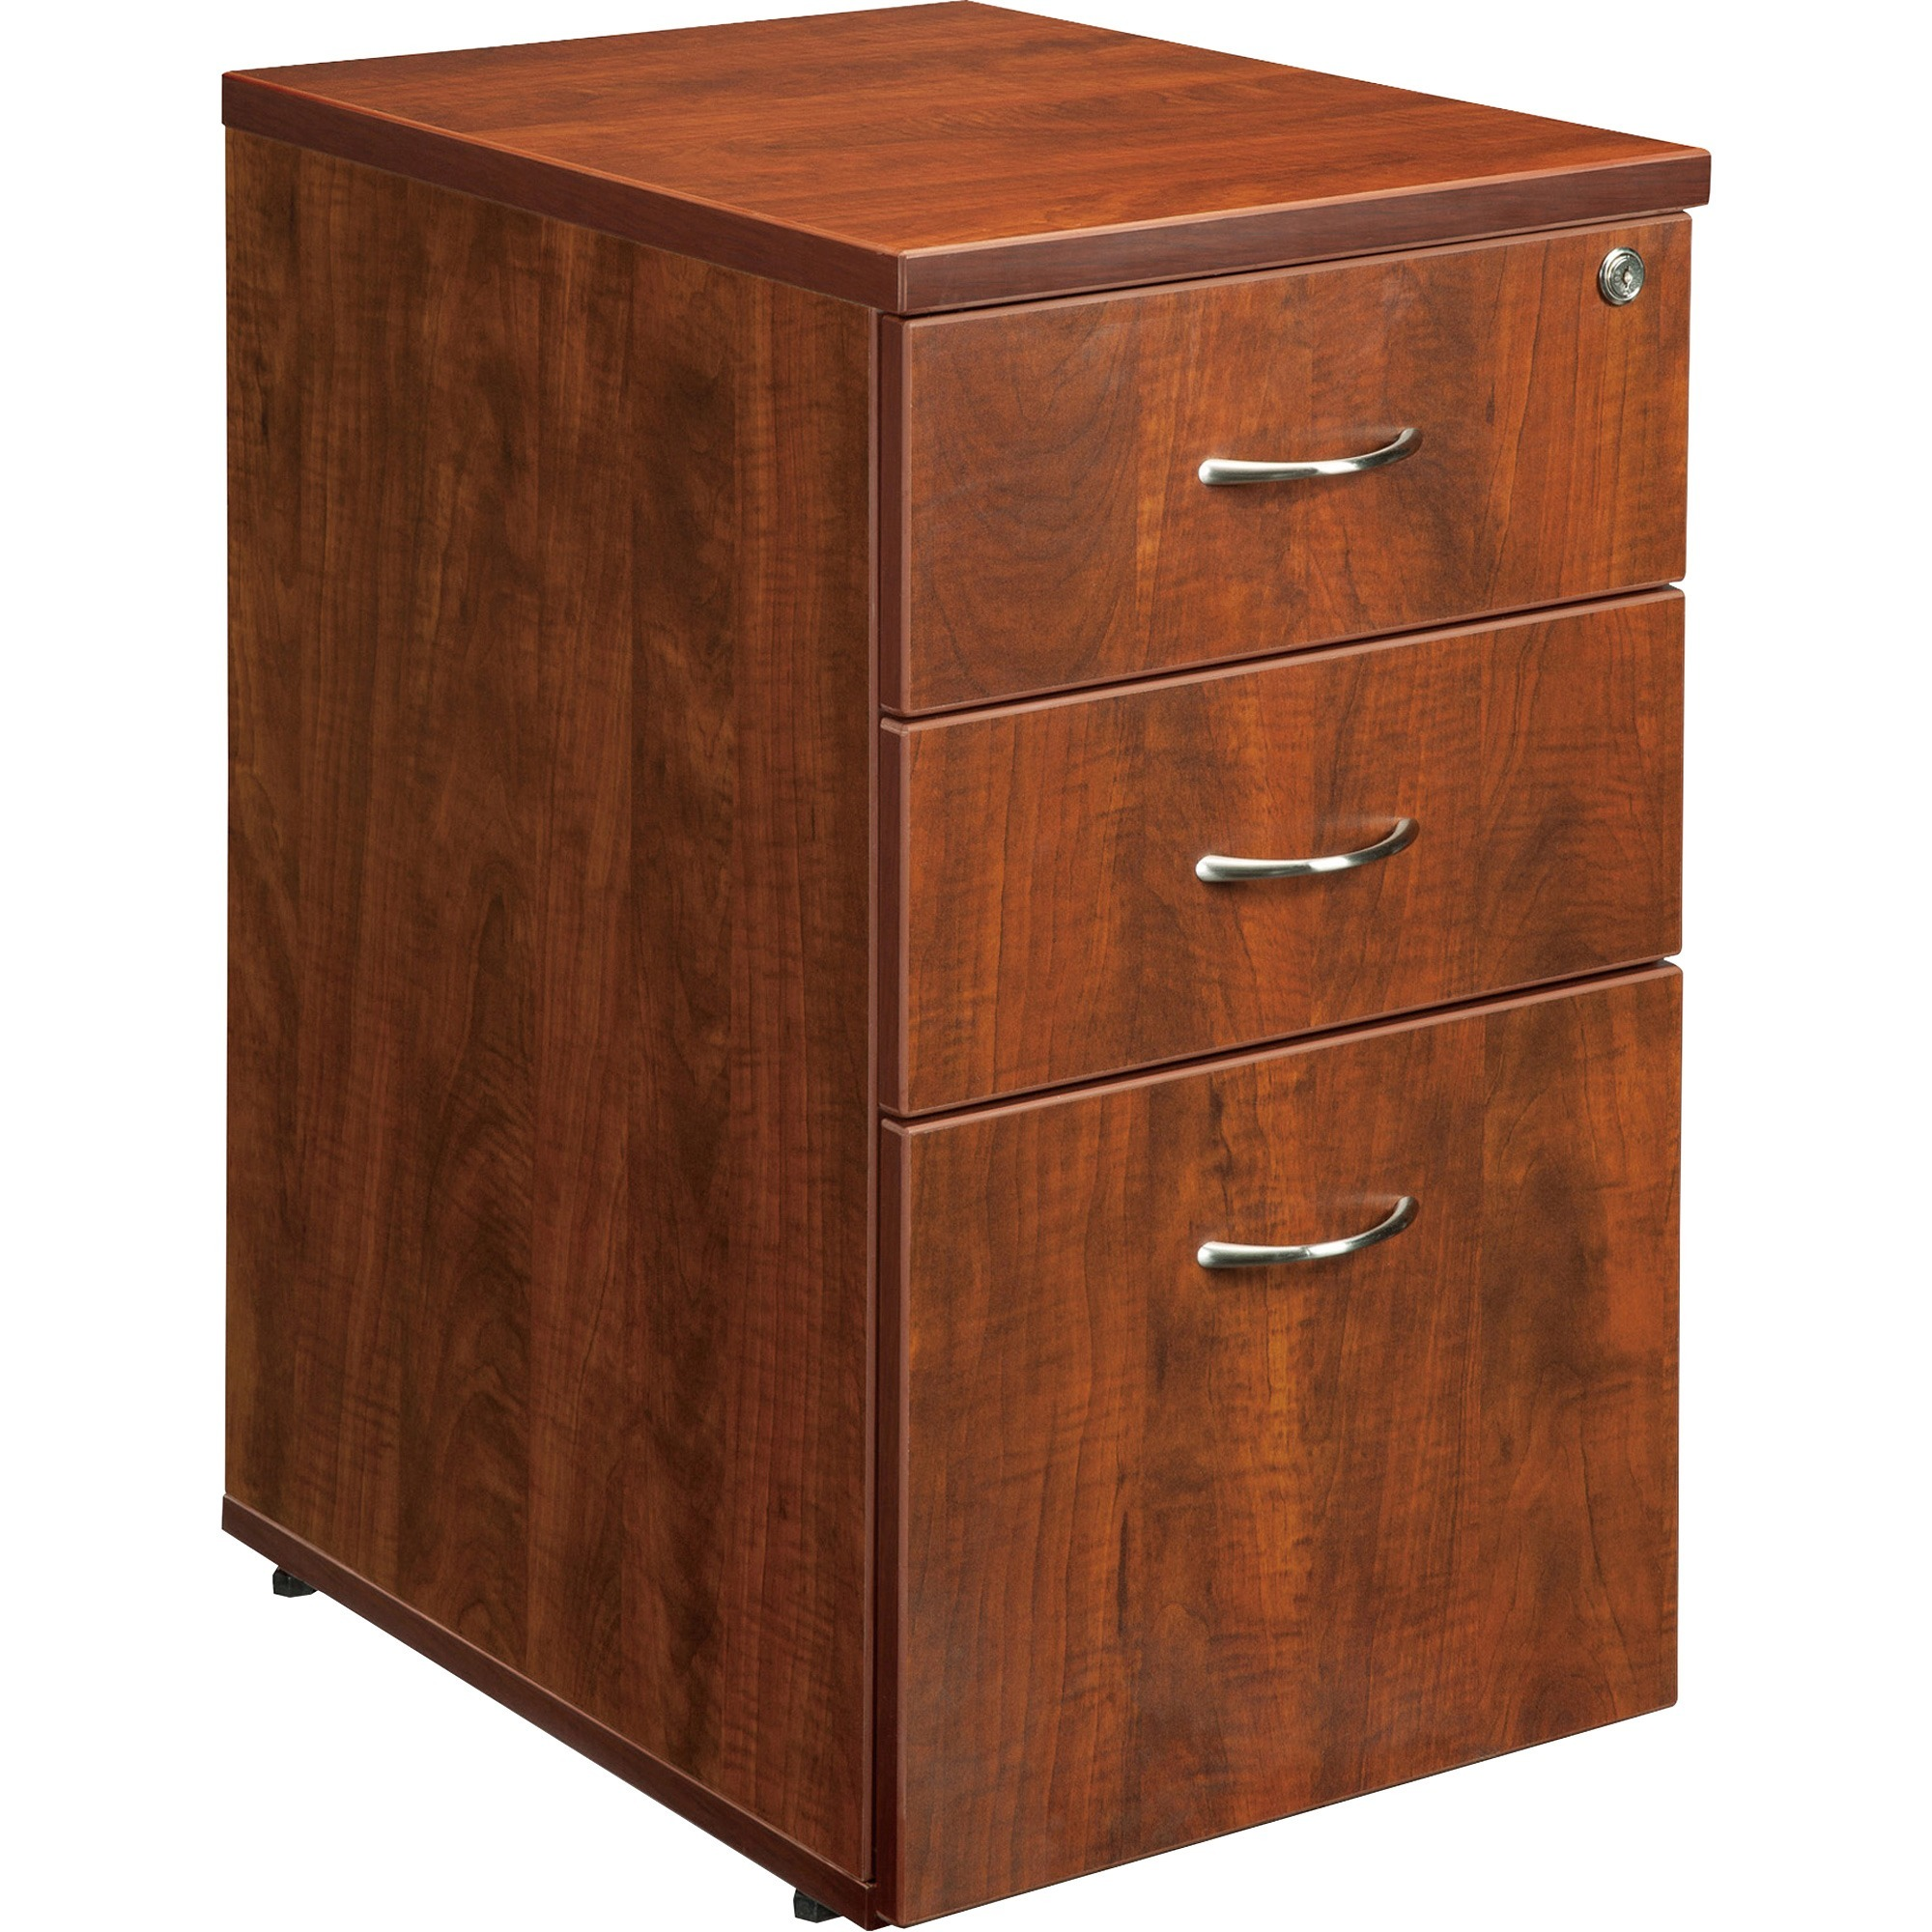 3 Drawers Vertical Wood Composite Lockable Filing Cabinet ...